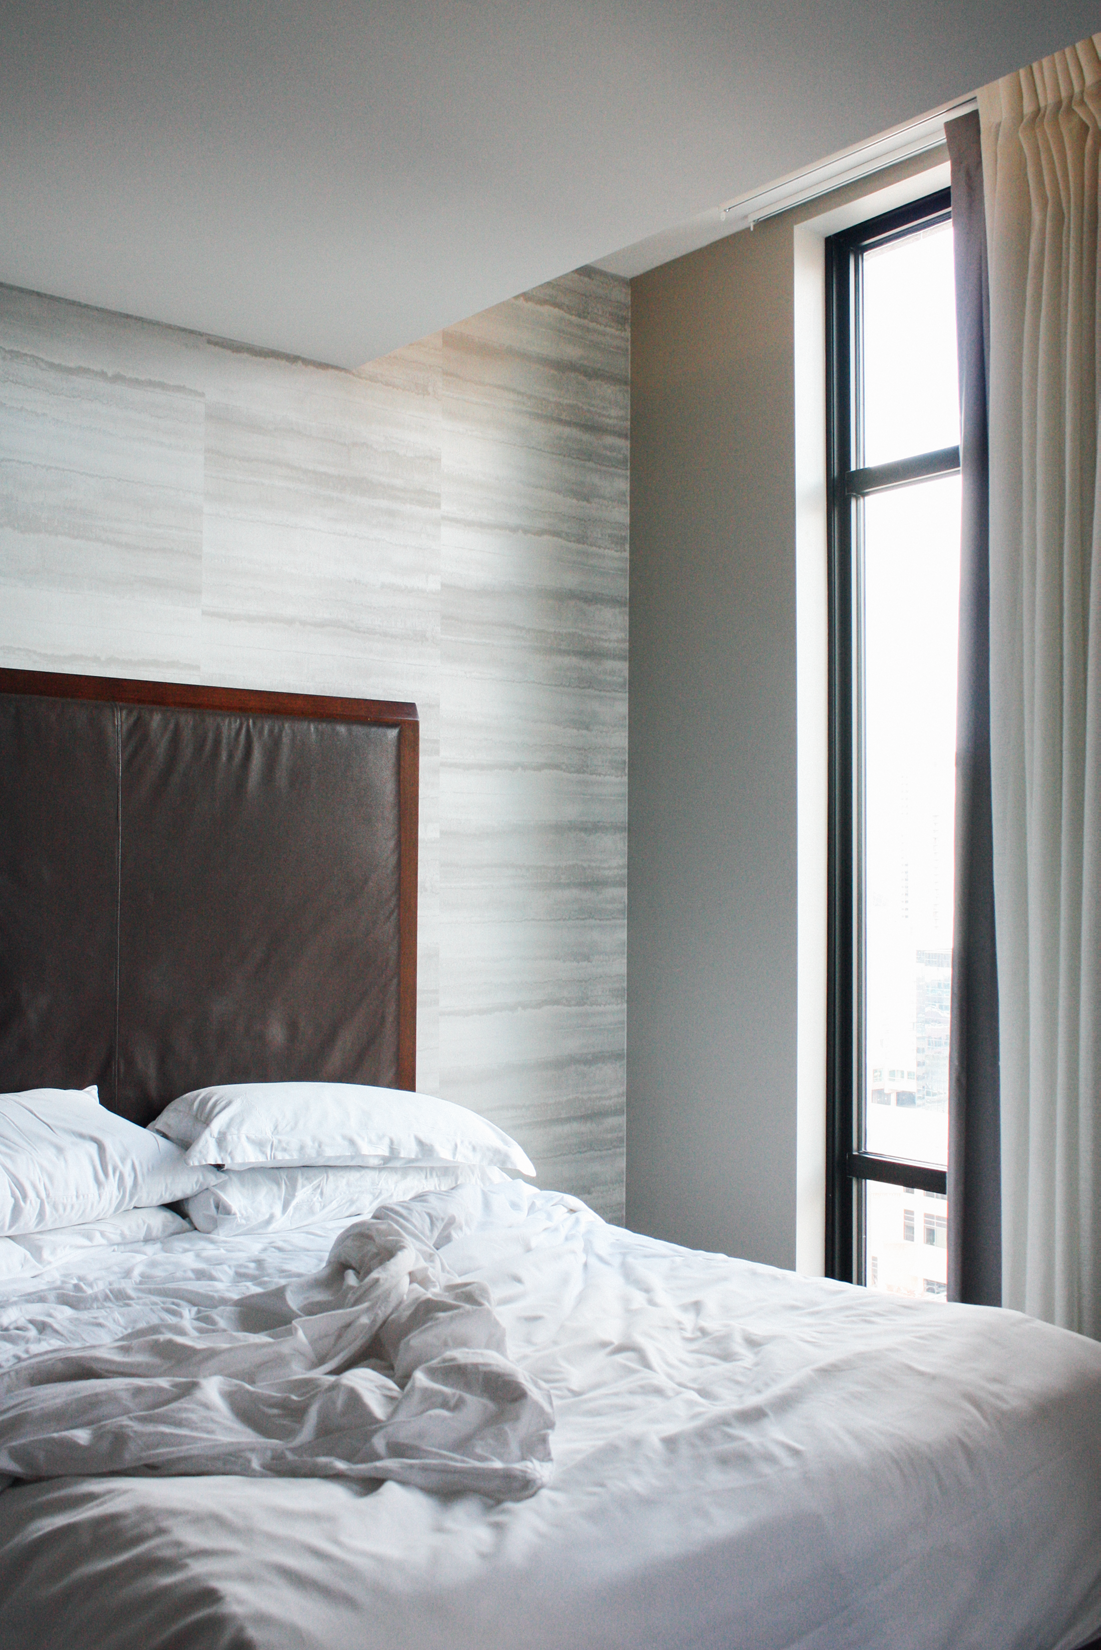 Home Sweet Hotel: The Hotel Ivy | truelane